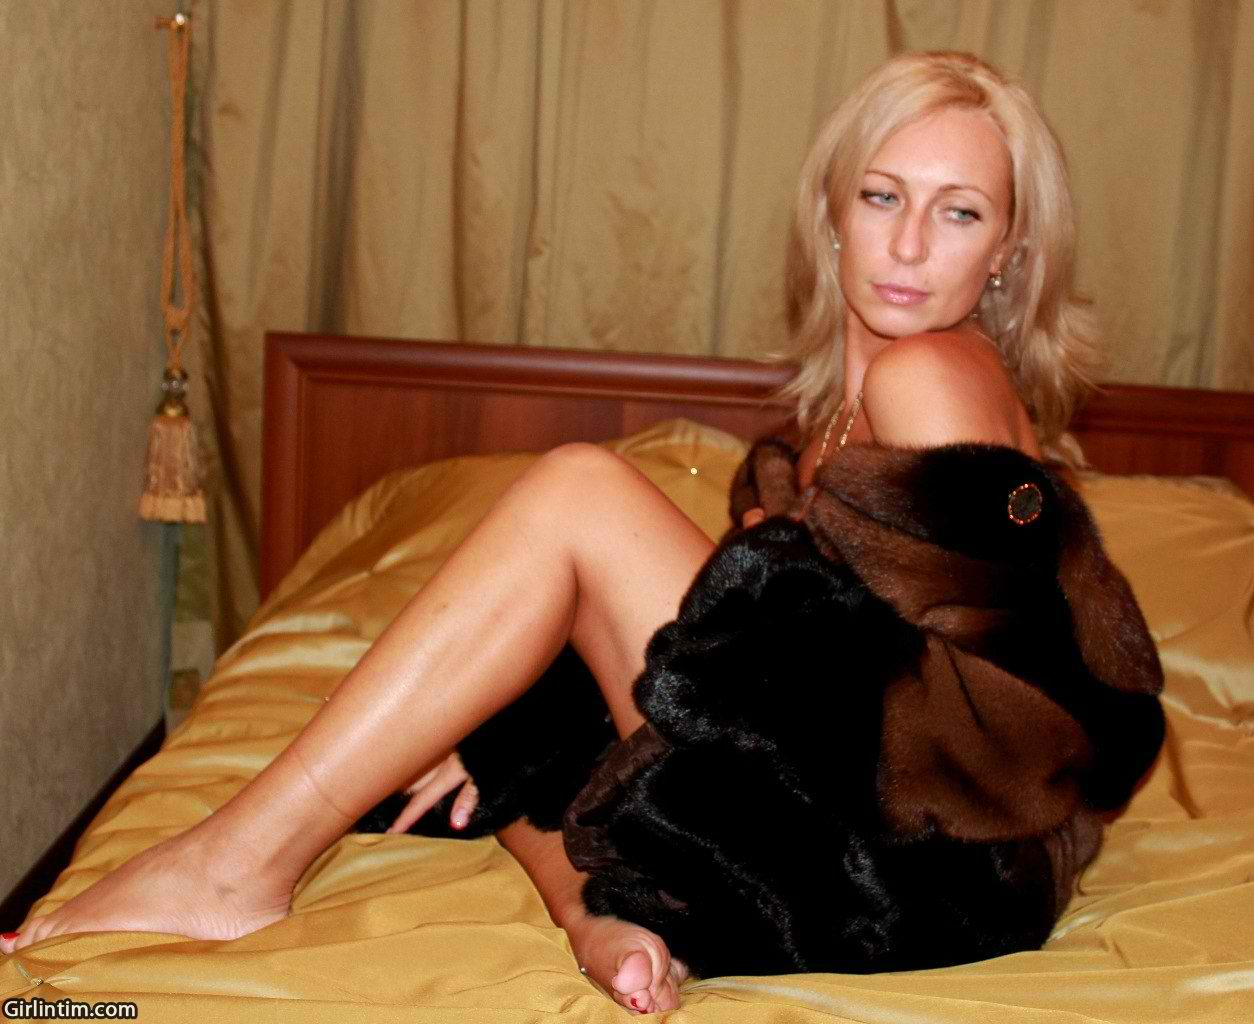 Проститутки индевидуалки москва 16 фотография